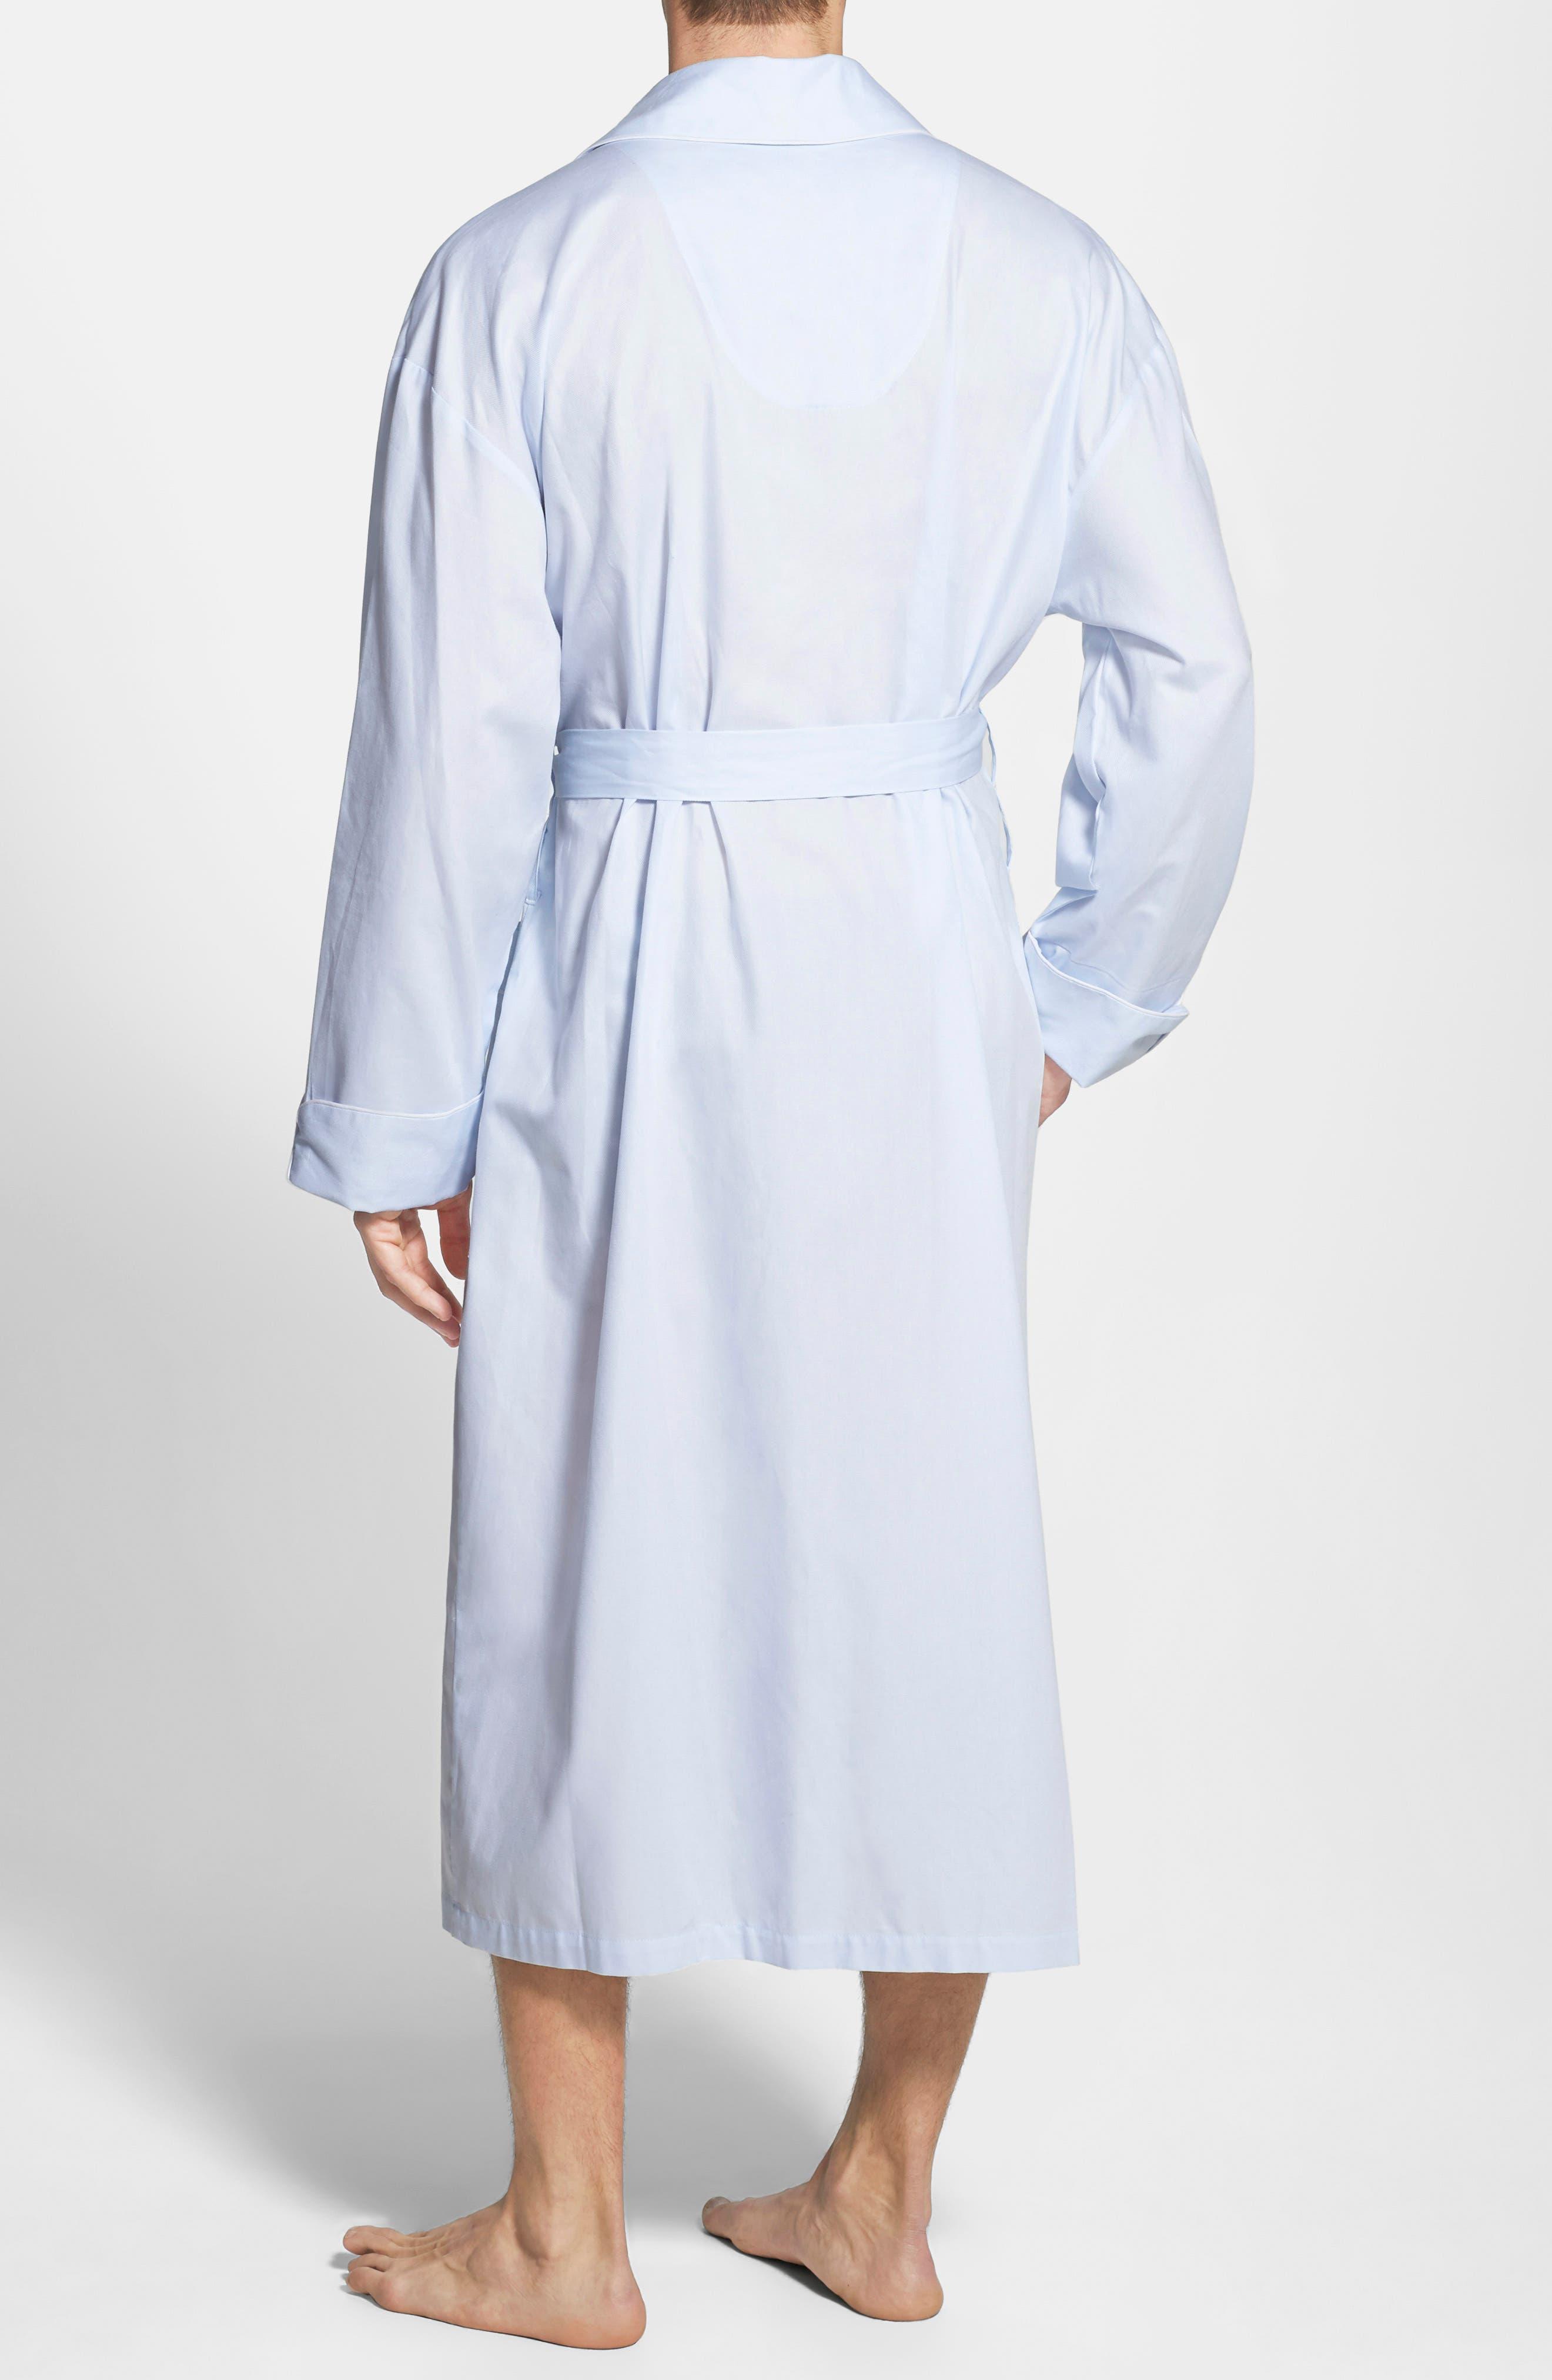 MAJESTIC INTERNATIONAL,                             'Signature' Cotton Robe,                             Alternate thumbnail 4, color,                             SURF